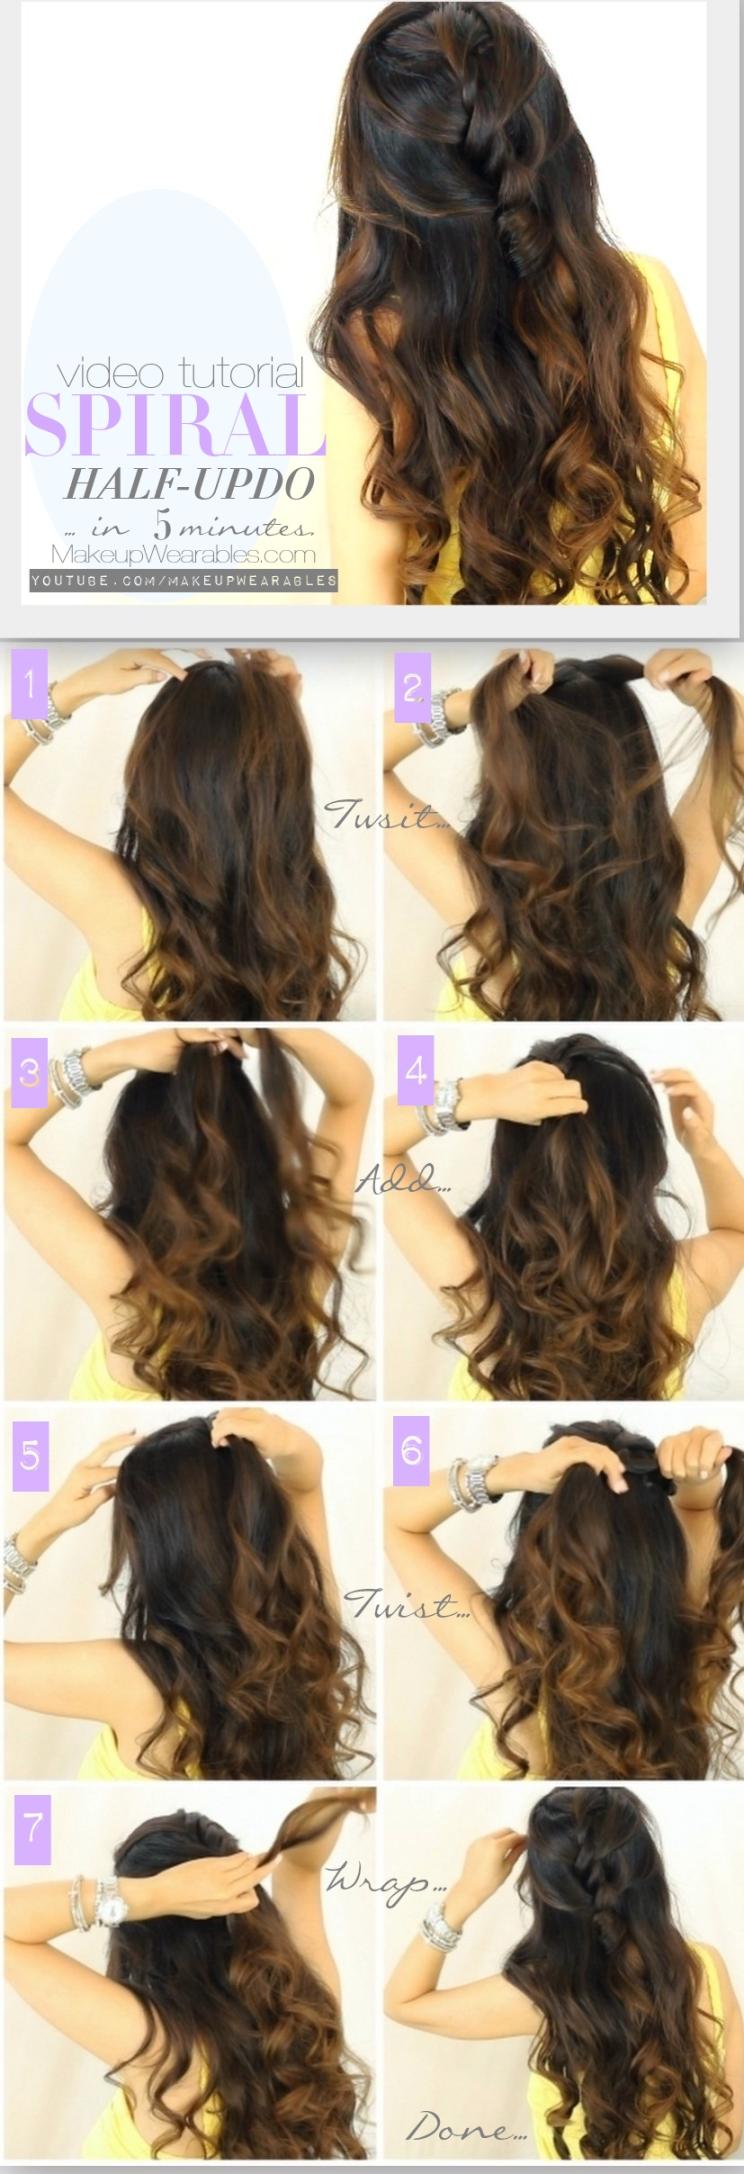 Fantastic 13 Half Up Half Down Hair Tutorials Short Hairstyles For Black Women Fulllsitofus